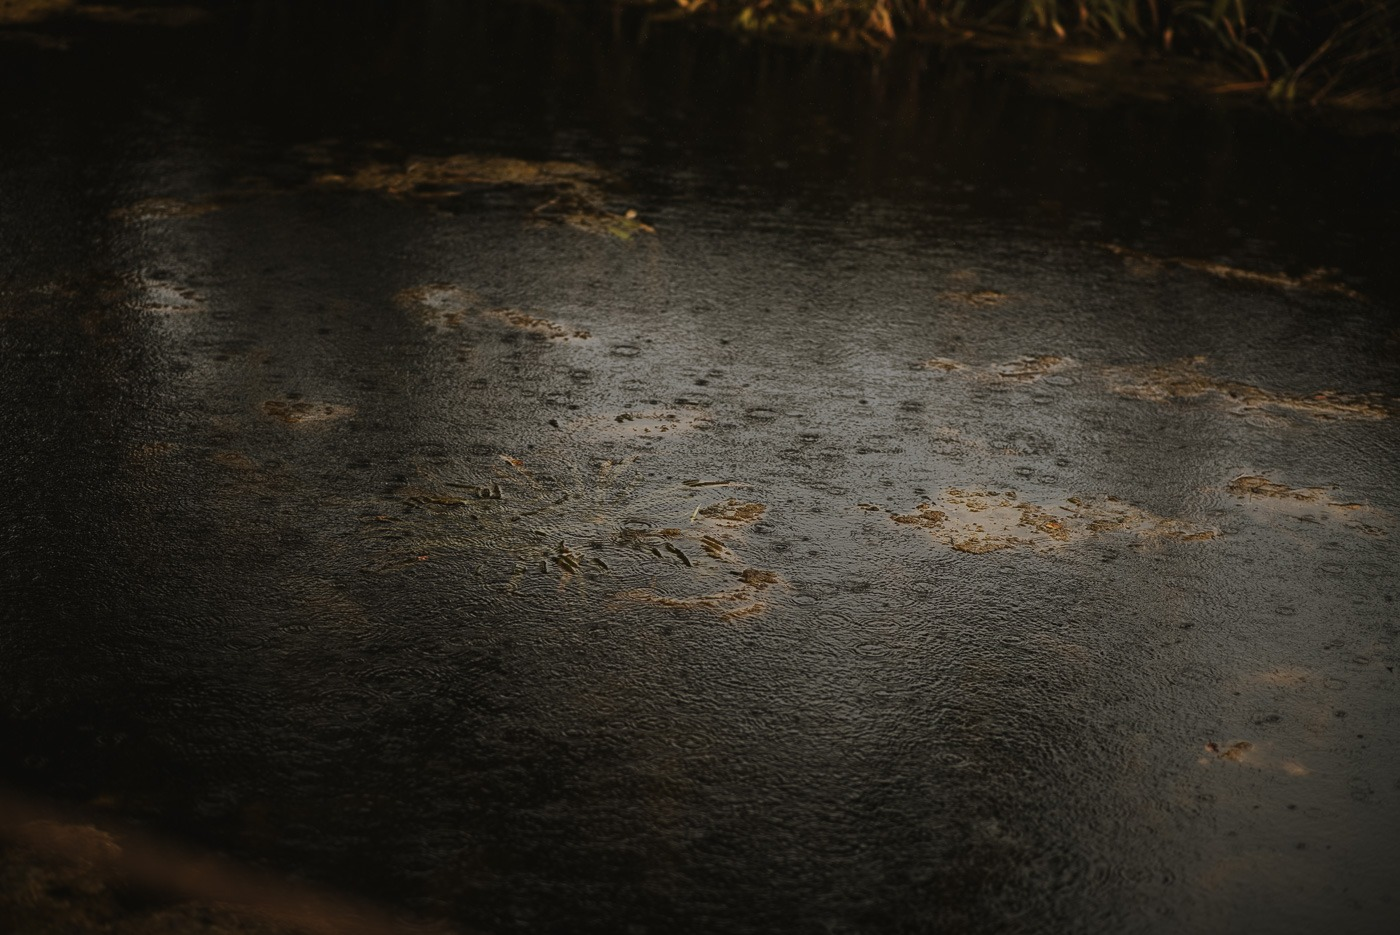 A very dark water